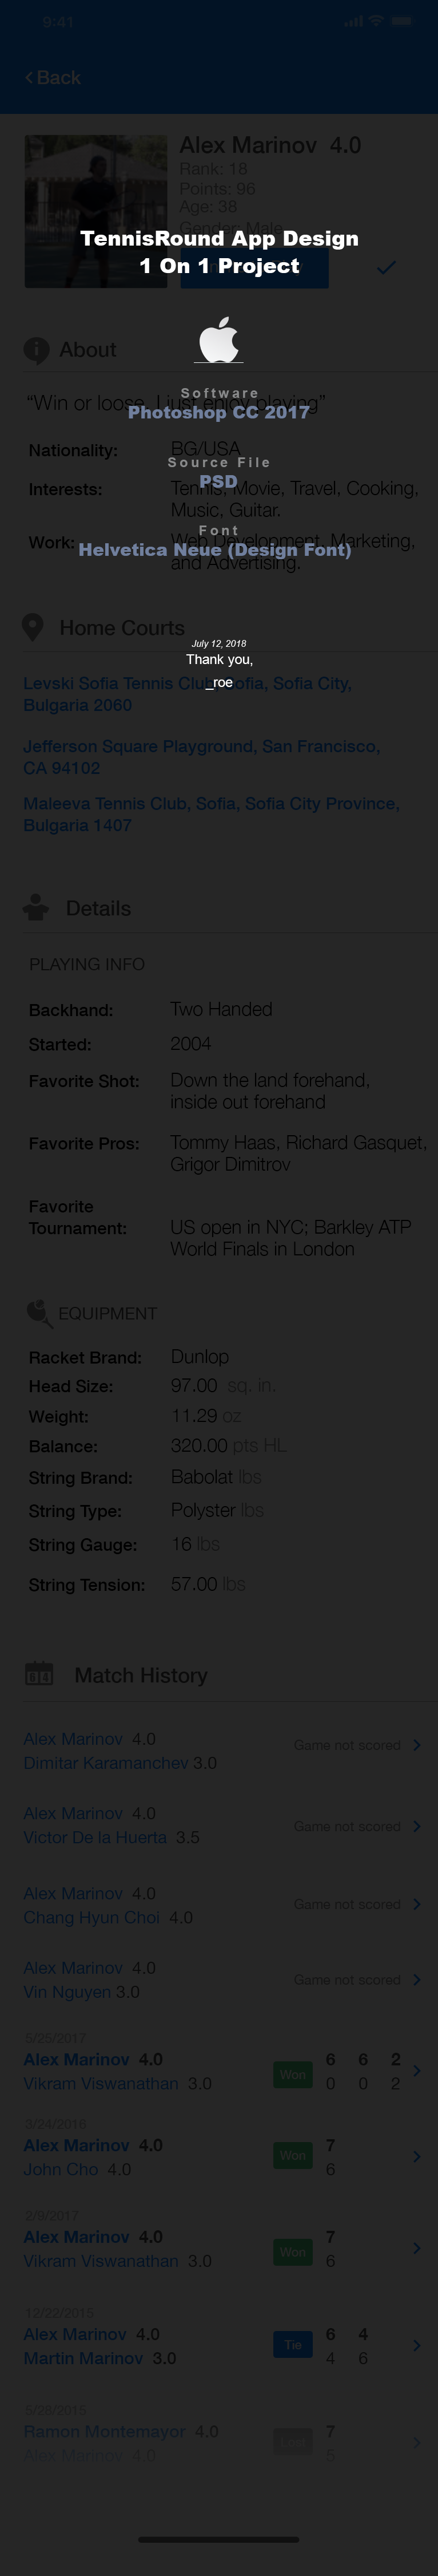 Tennis Round Registration & Player Profile